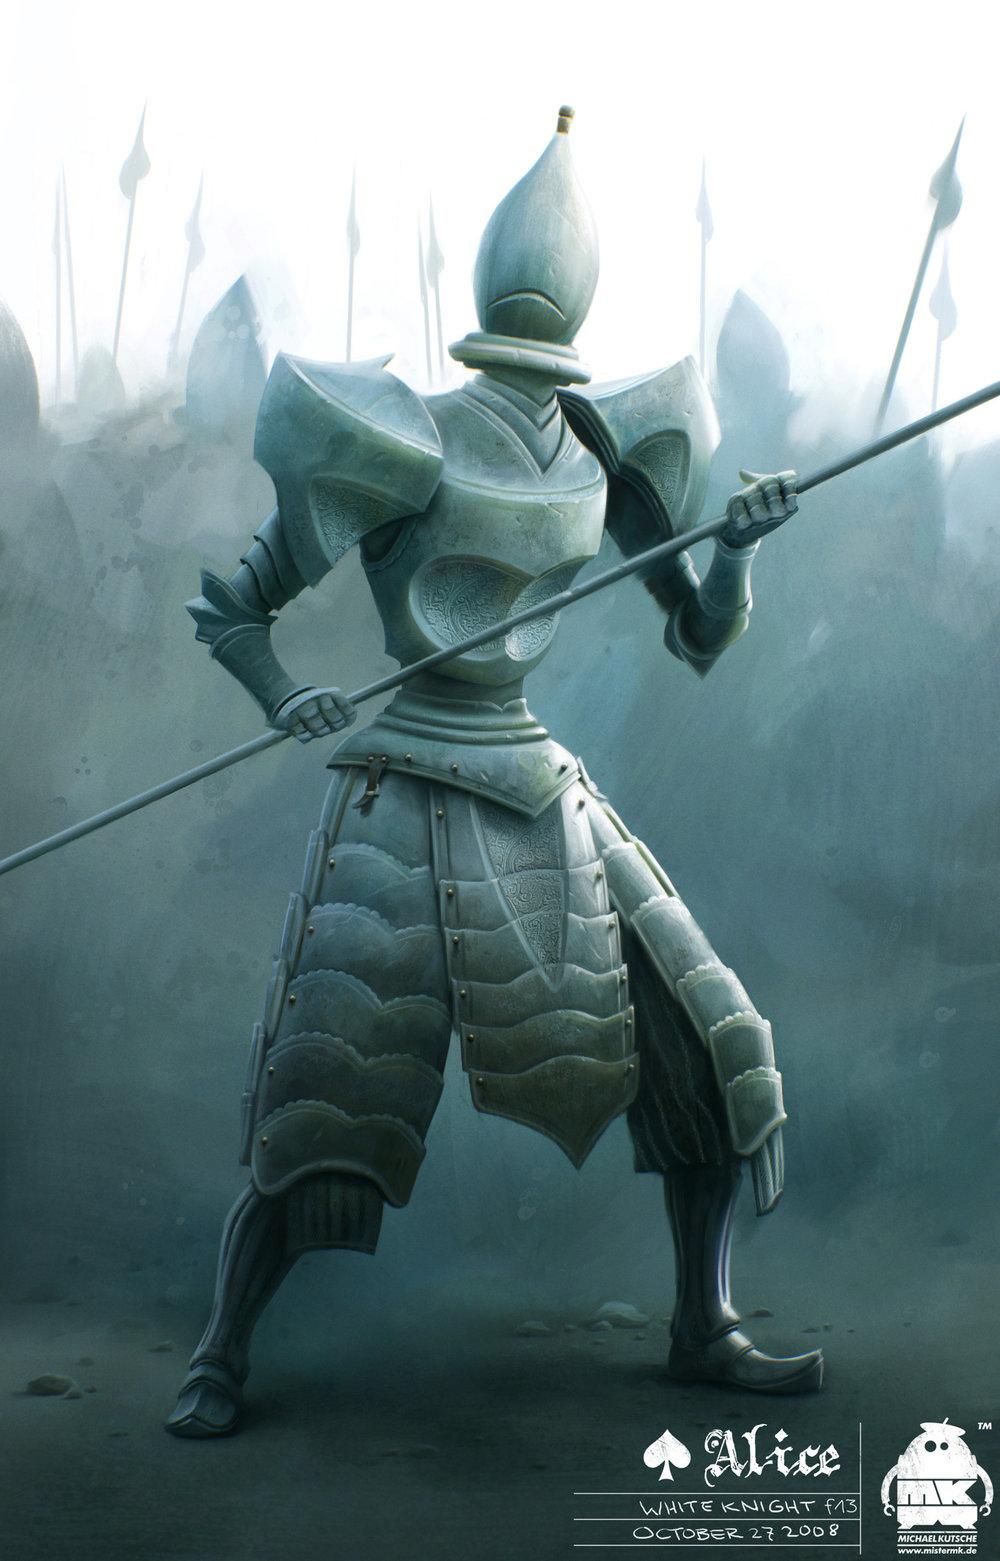 White_Knights_Concept_f13.jpg